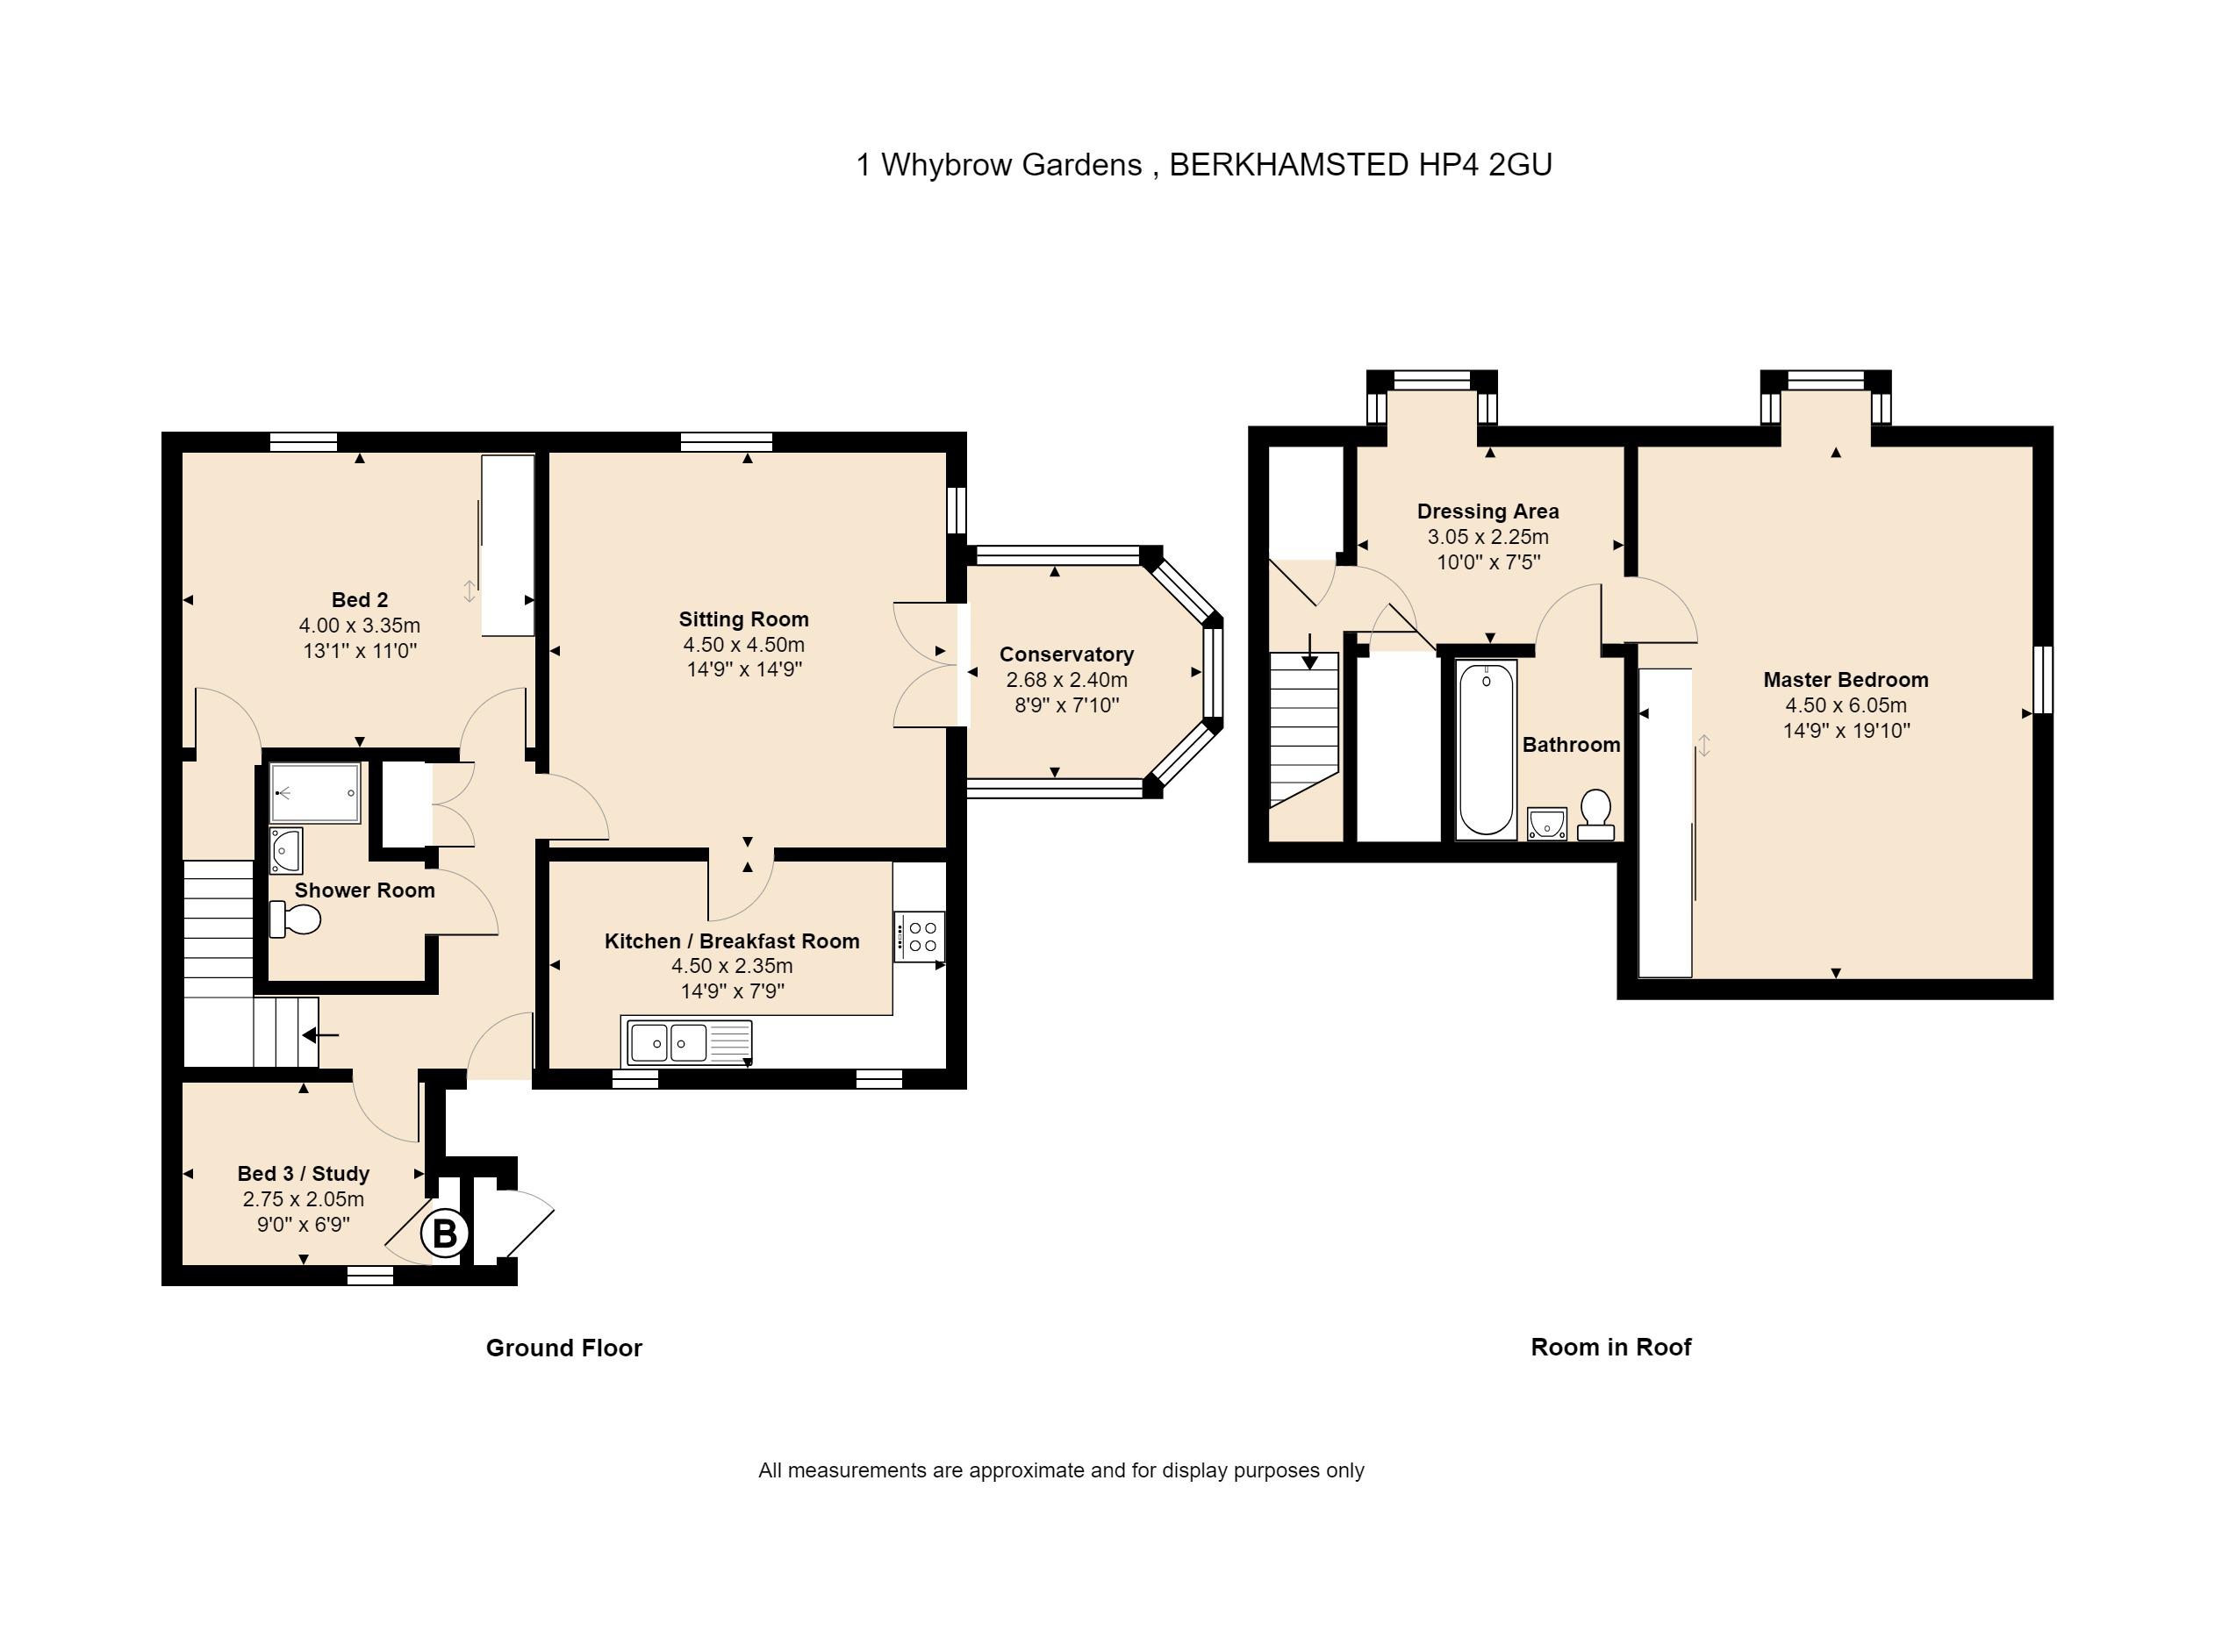 1 Whybrow Gardens Floorplan